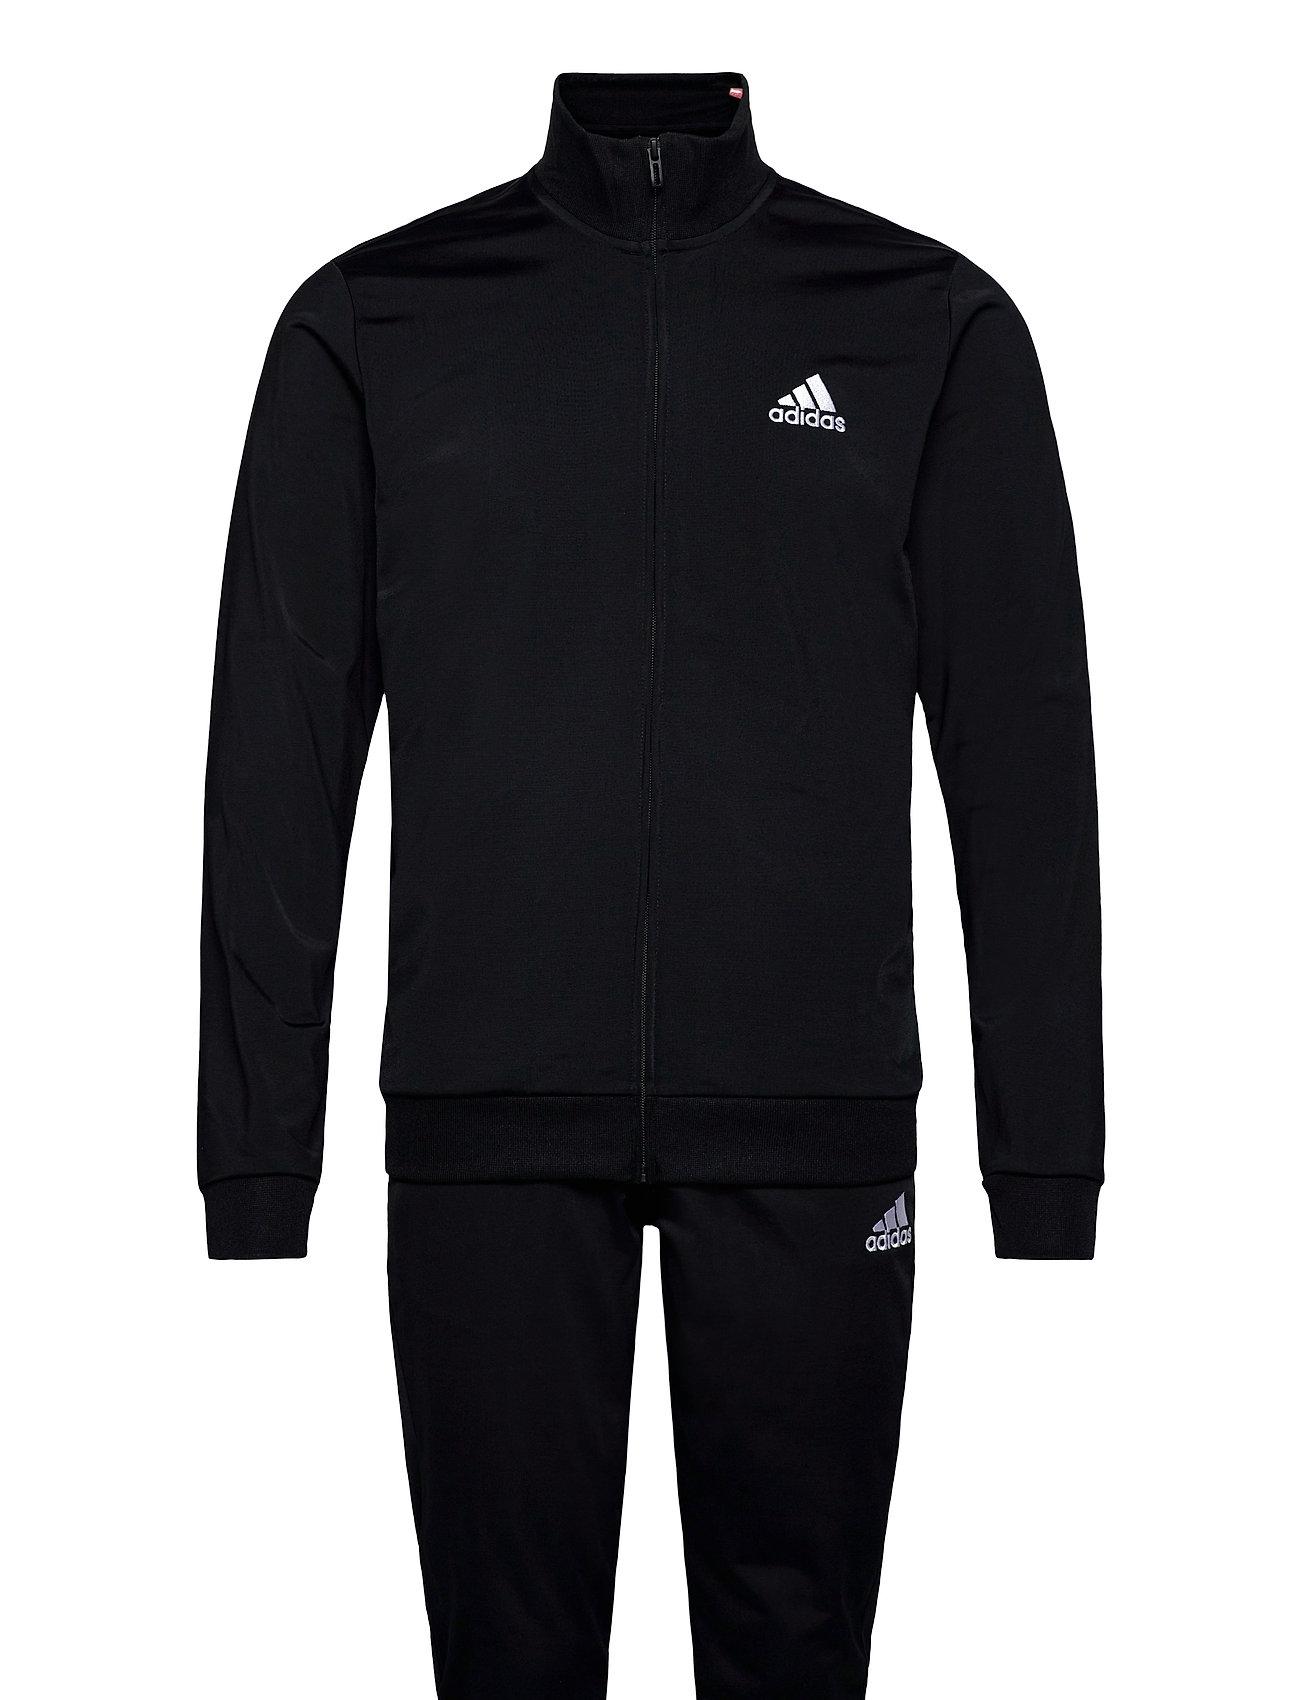 Primegreen Essentials Small Logo Track Suit Sweatshirts & Hoodies Tracksuits - SETS Sort Adidas Performance